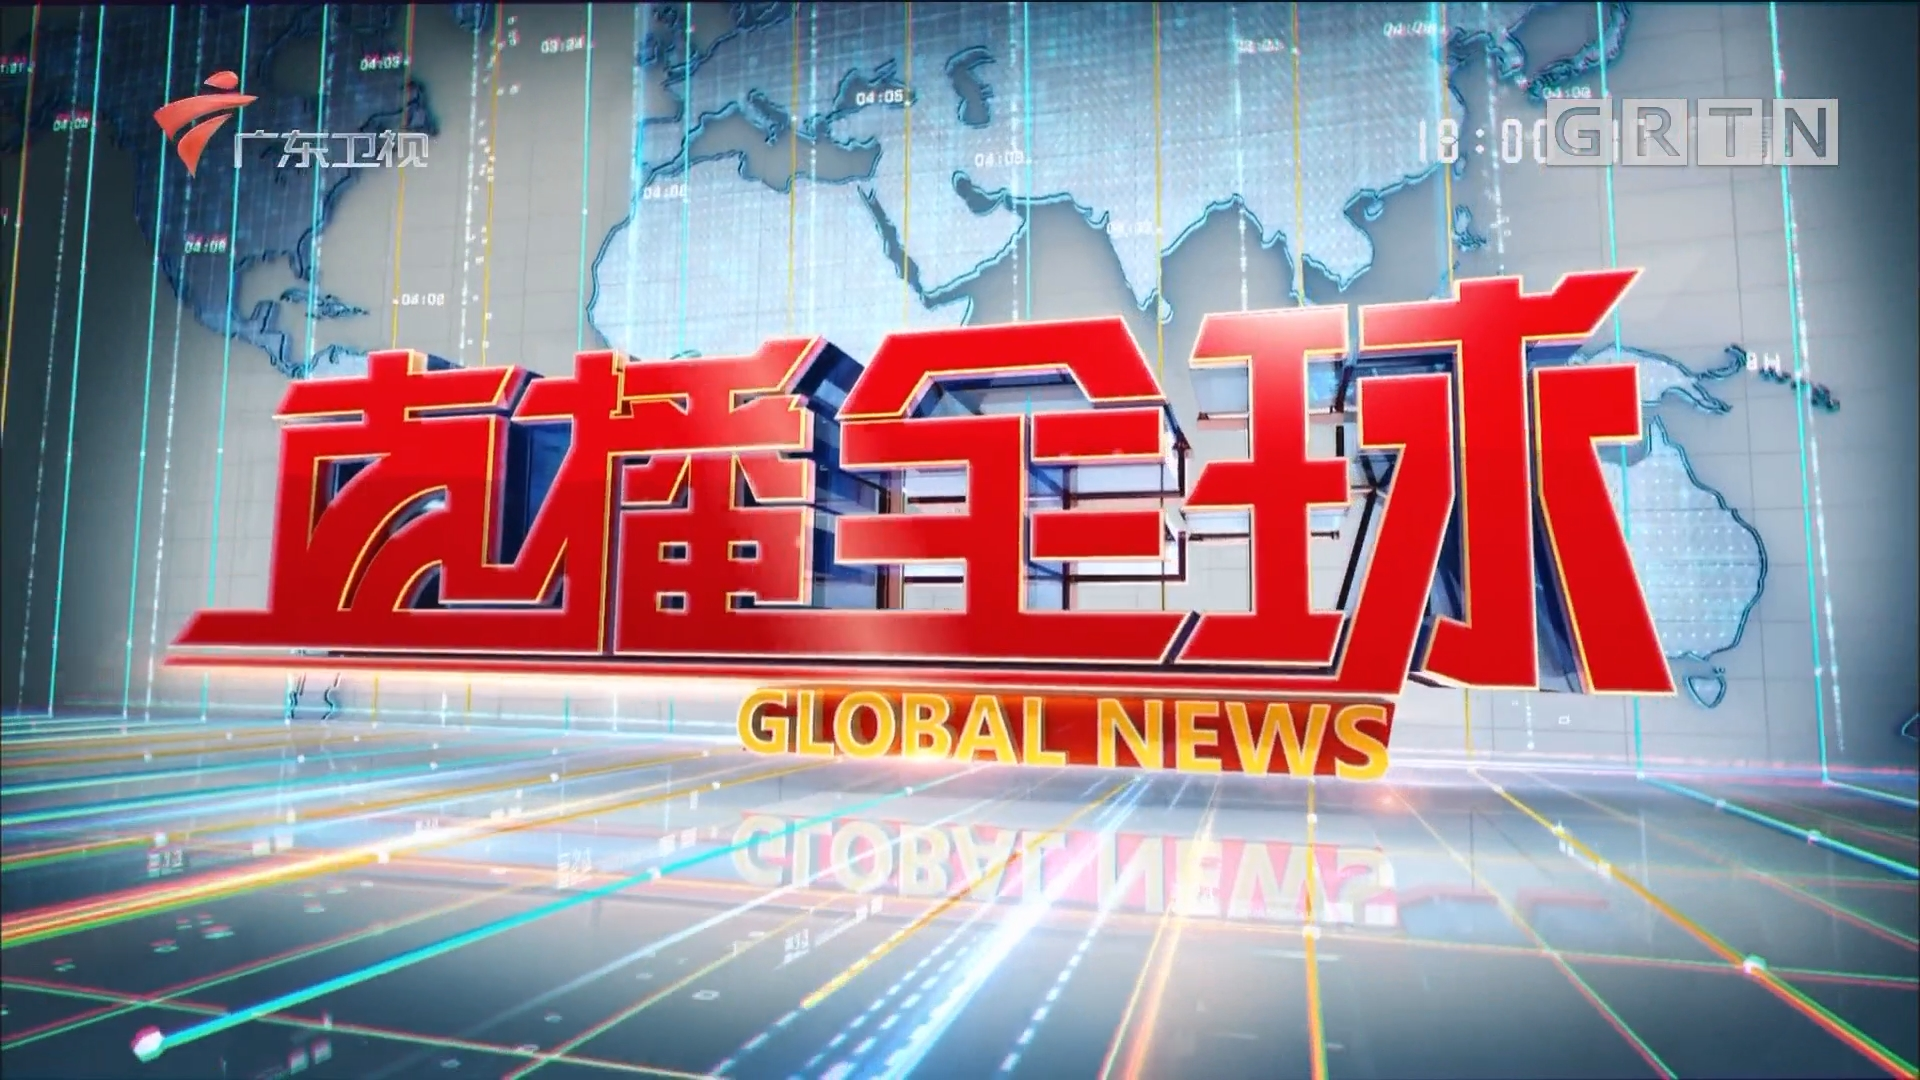 [HD][2017-10-18]直播全球:洋小伙学粤剧 见证中华文脉传承:迷上中国味道 始于中国戏曲